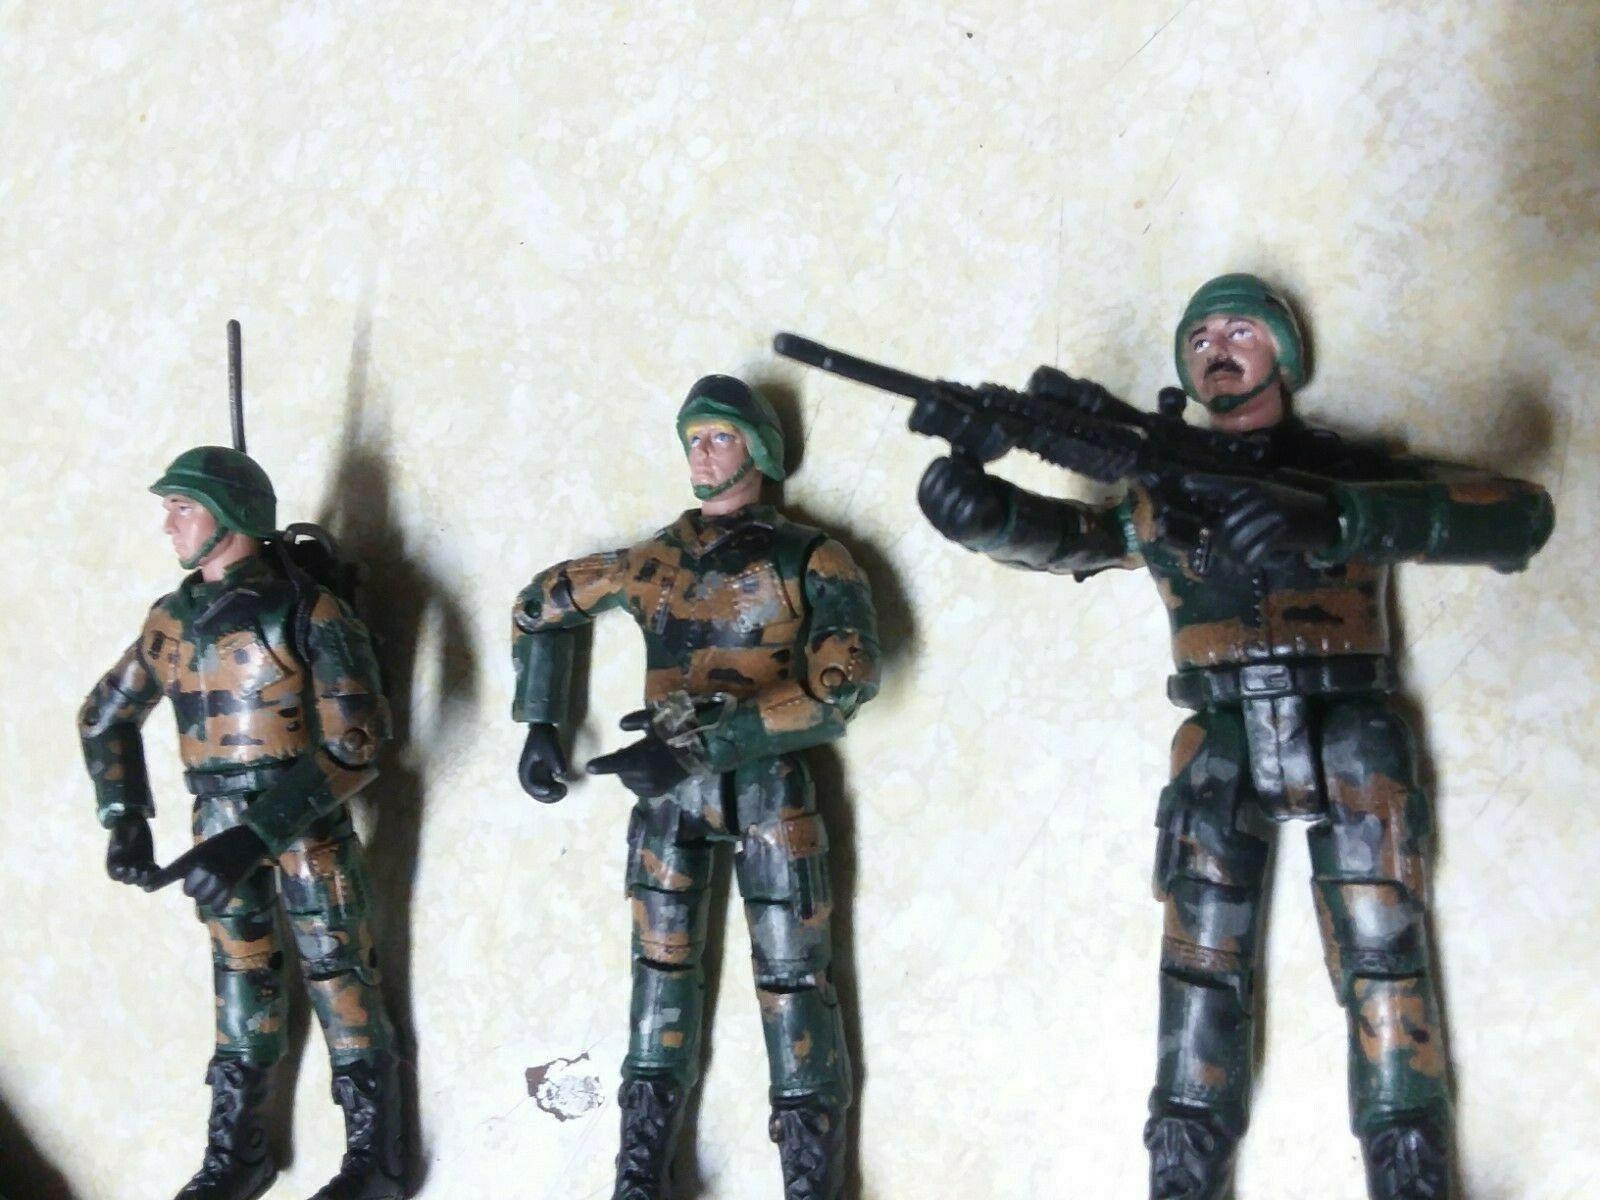 Action 1:18 Elite Force Toy Ranger 9 PC set